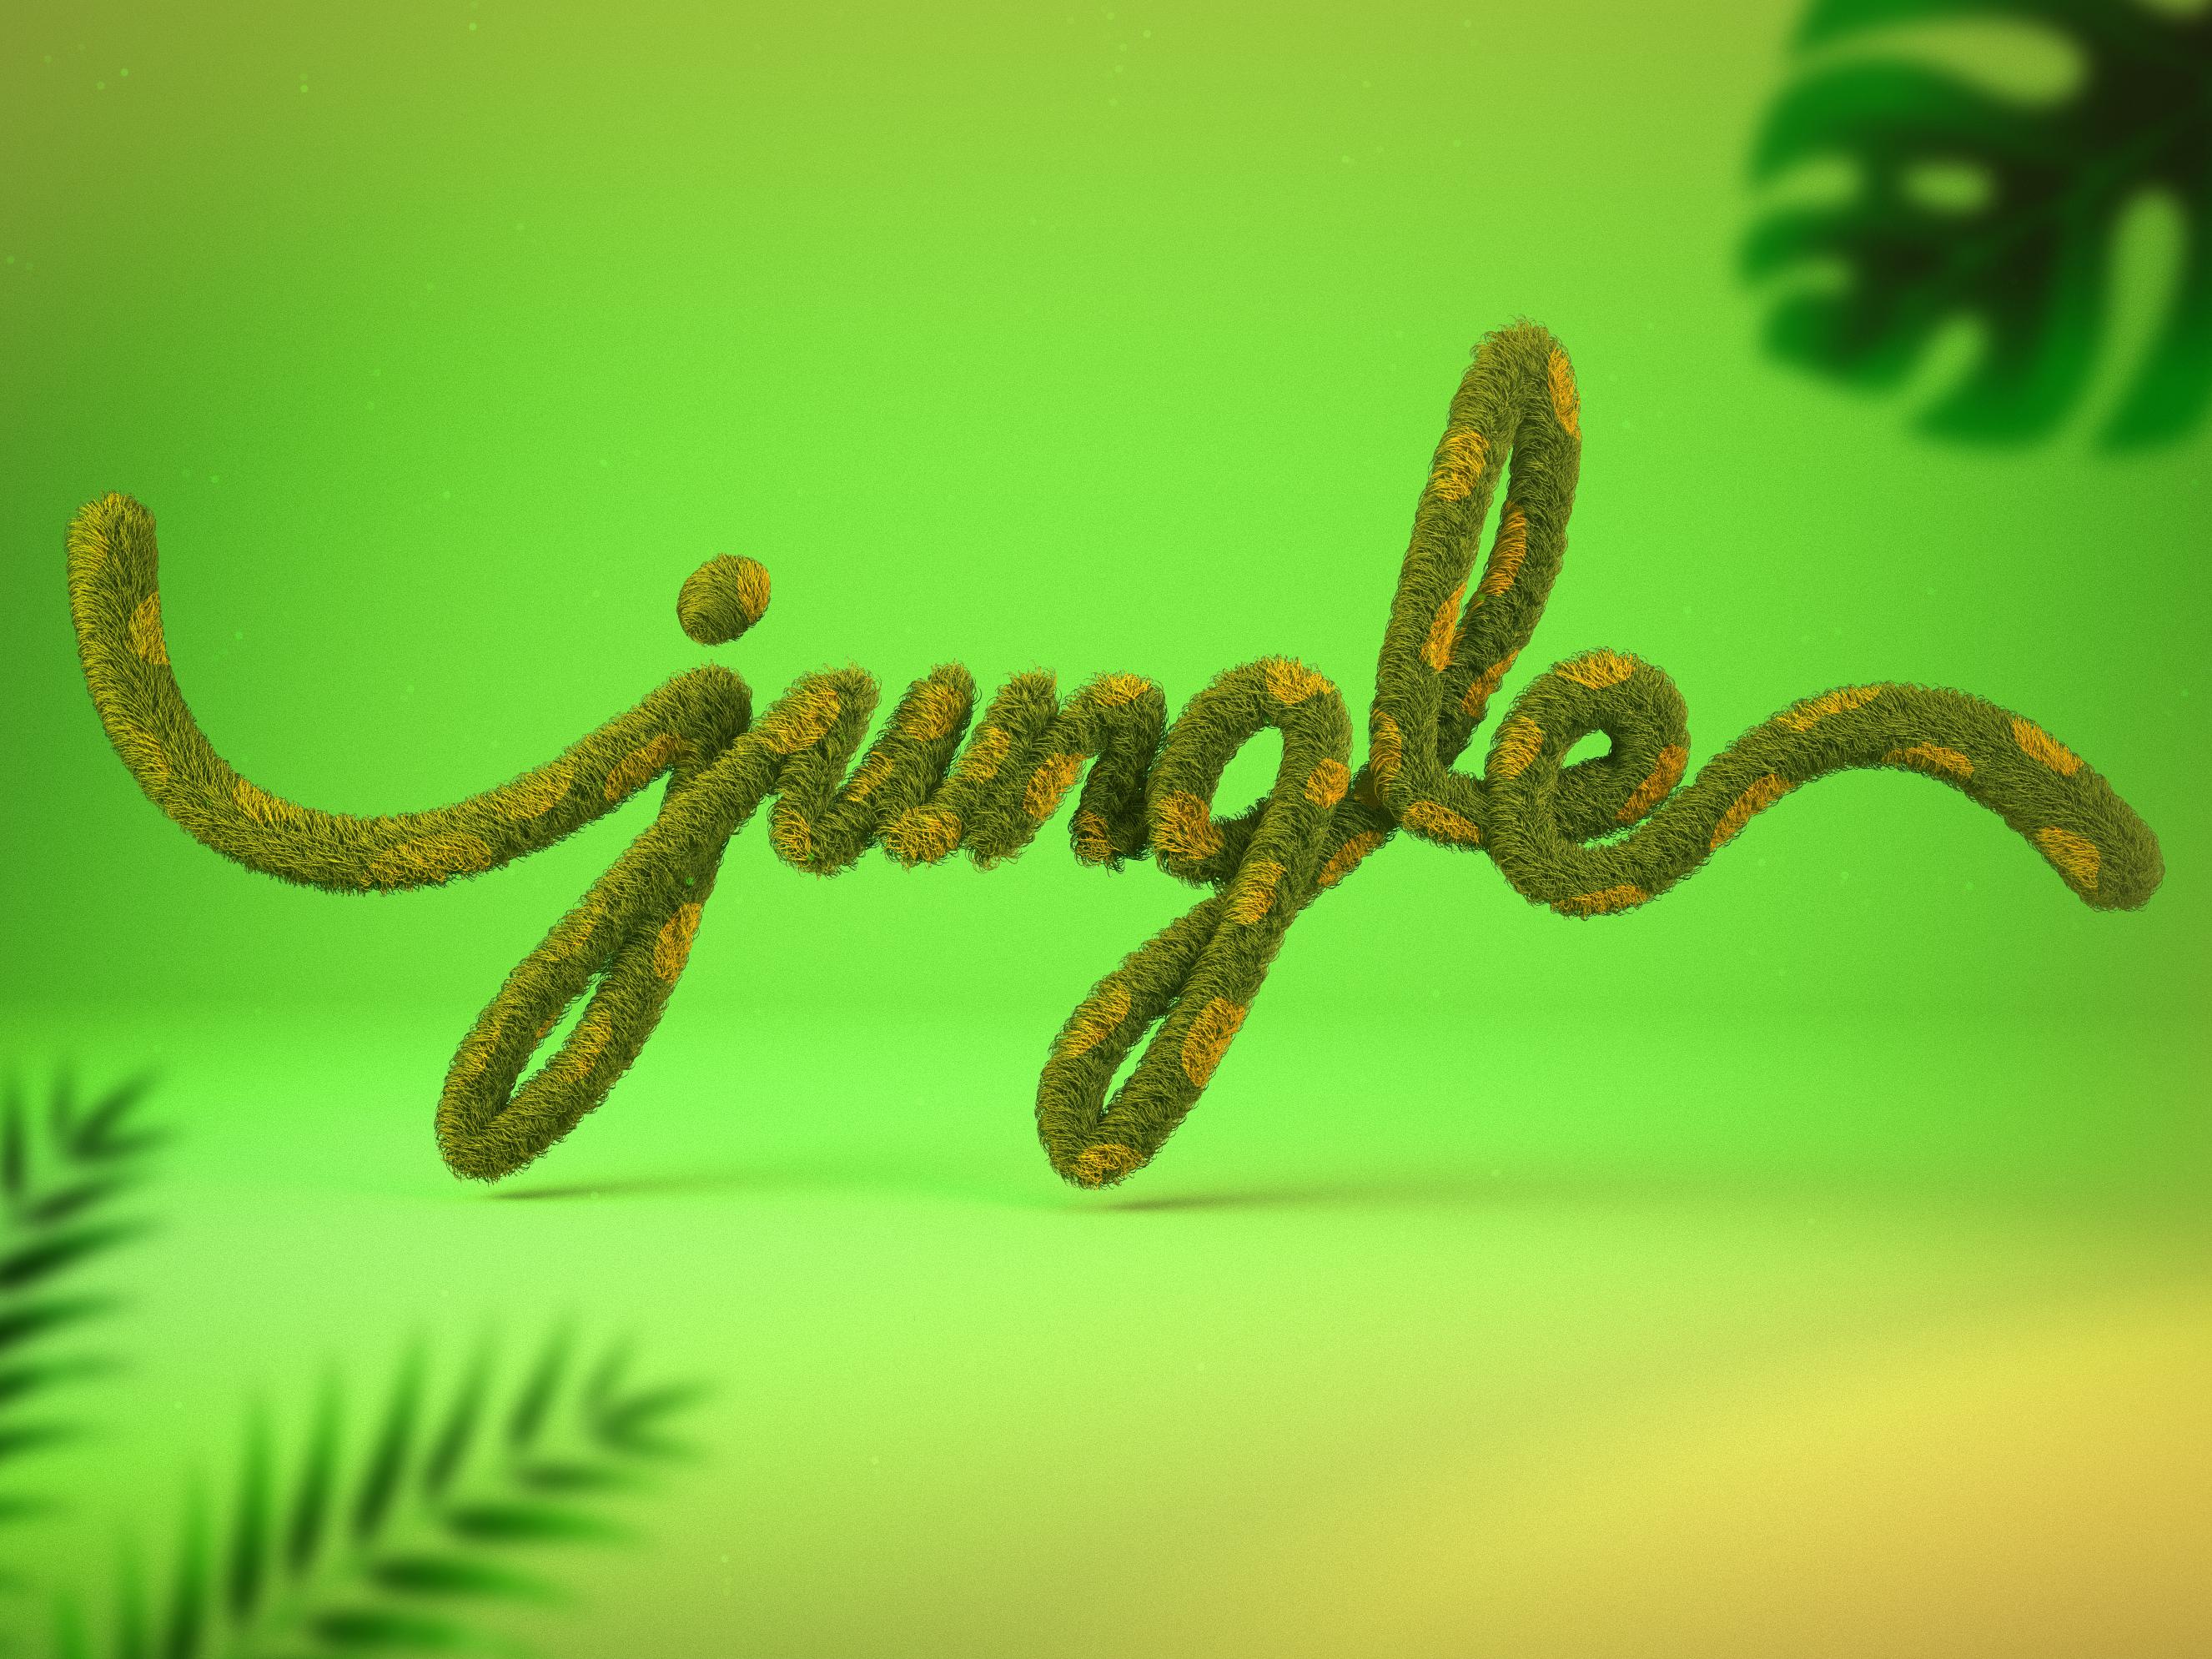 verde-jungle-800x600-n